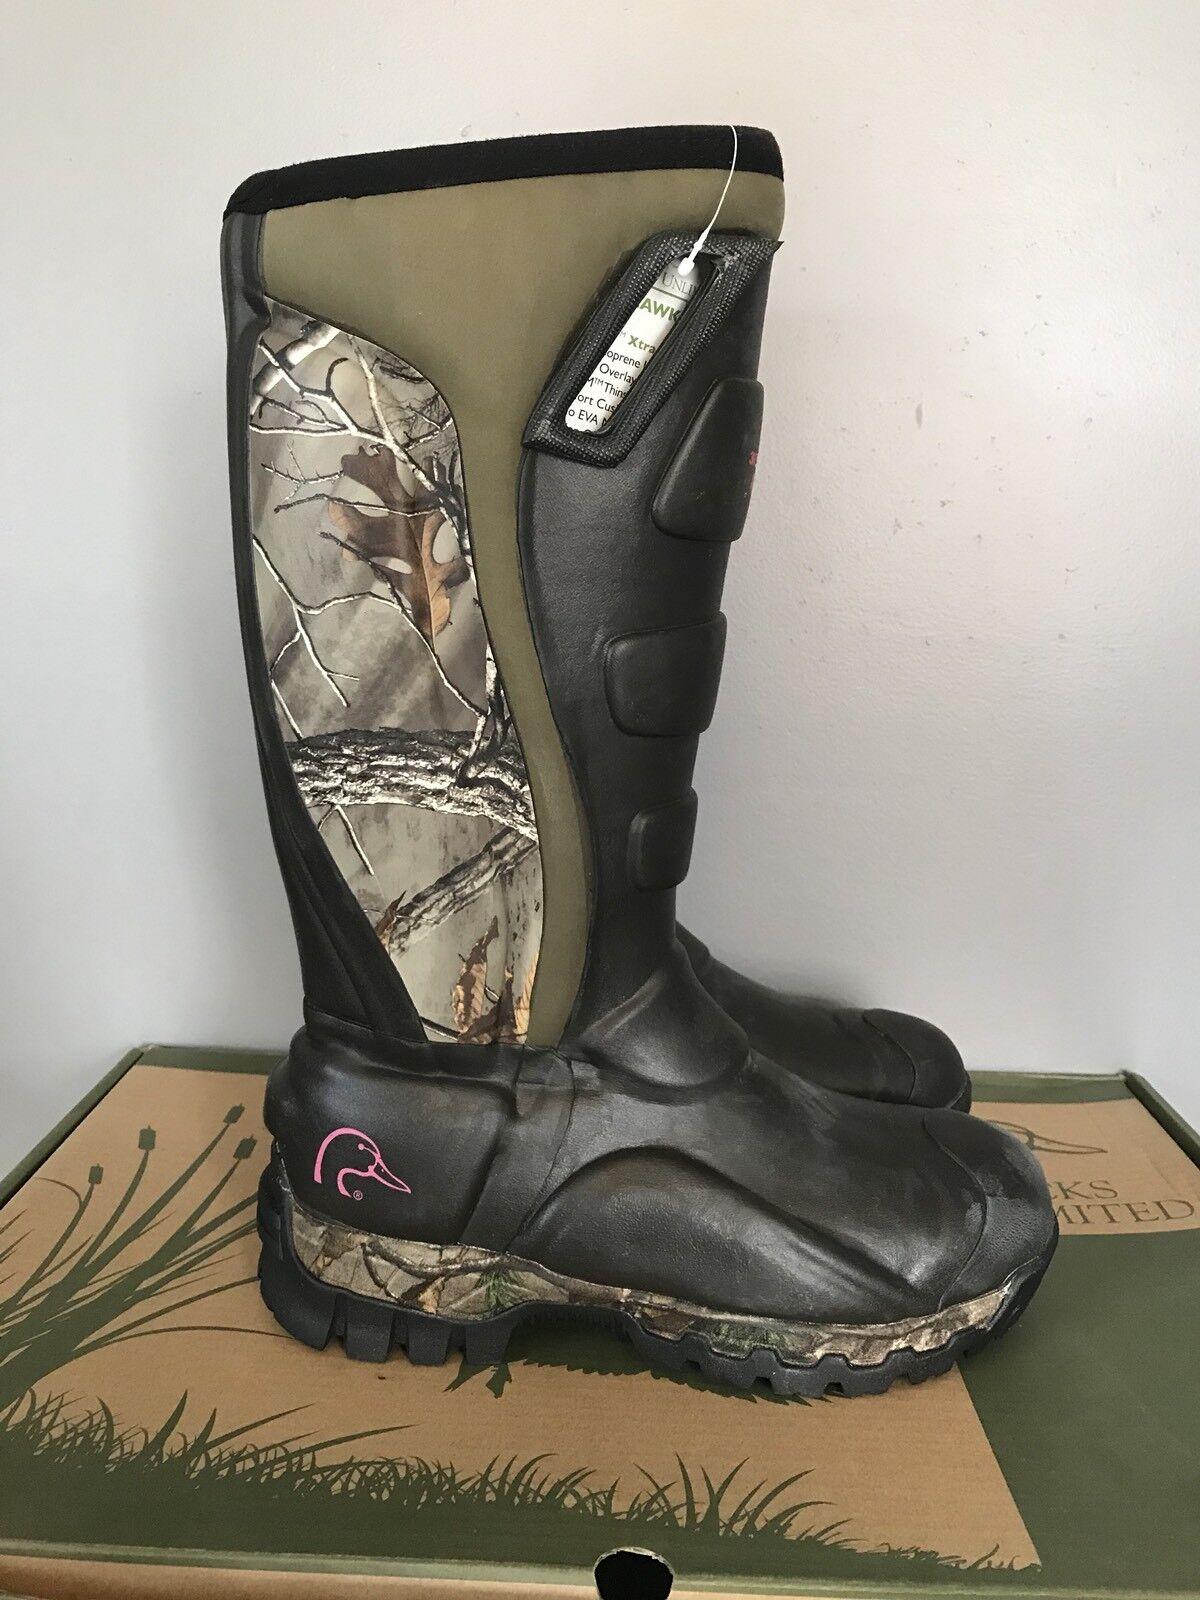 Ducks Unlimited Nighthawk 400g Thinsulate Camo Hunting Stiefel Damenschuhe 9 a4